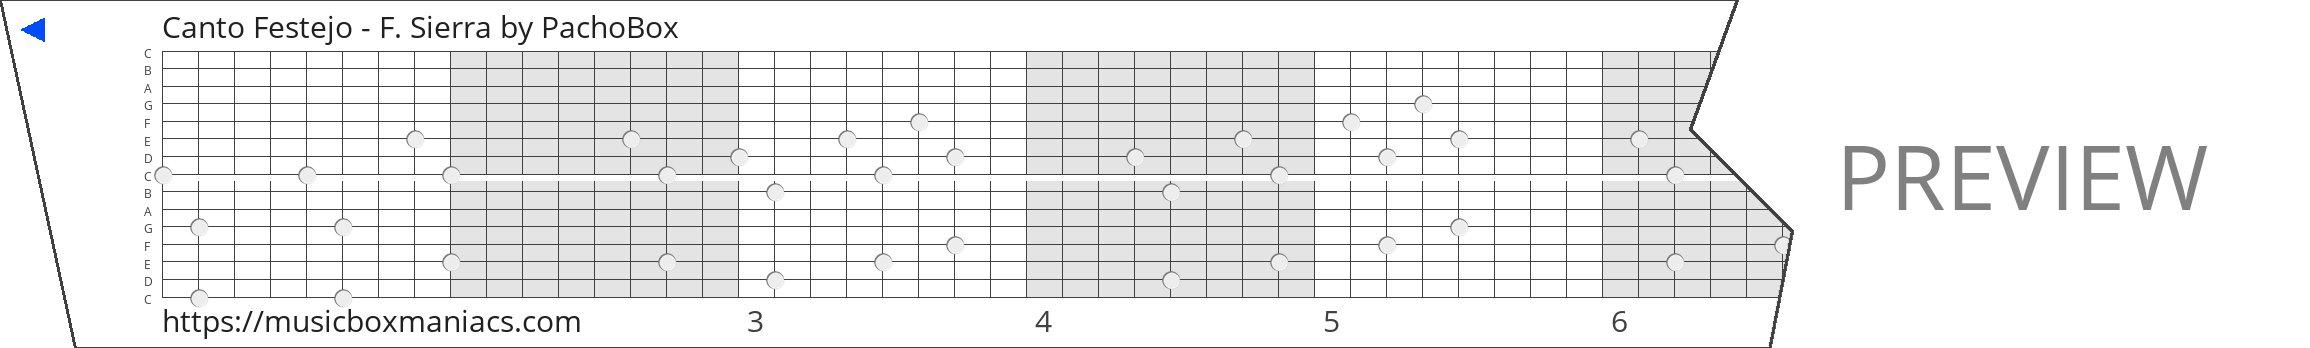 Canto Festejo - F. Sierra 15 note music box paper strip